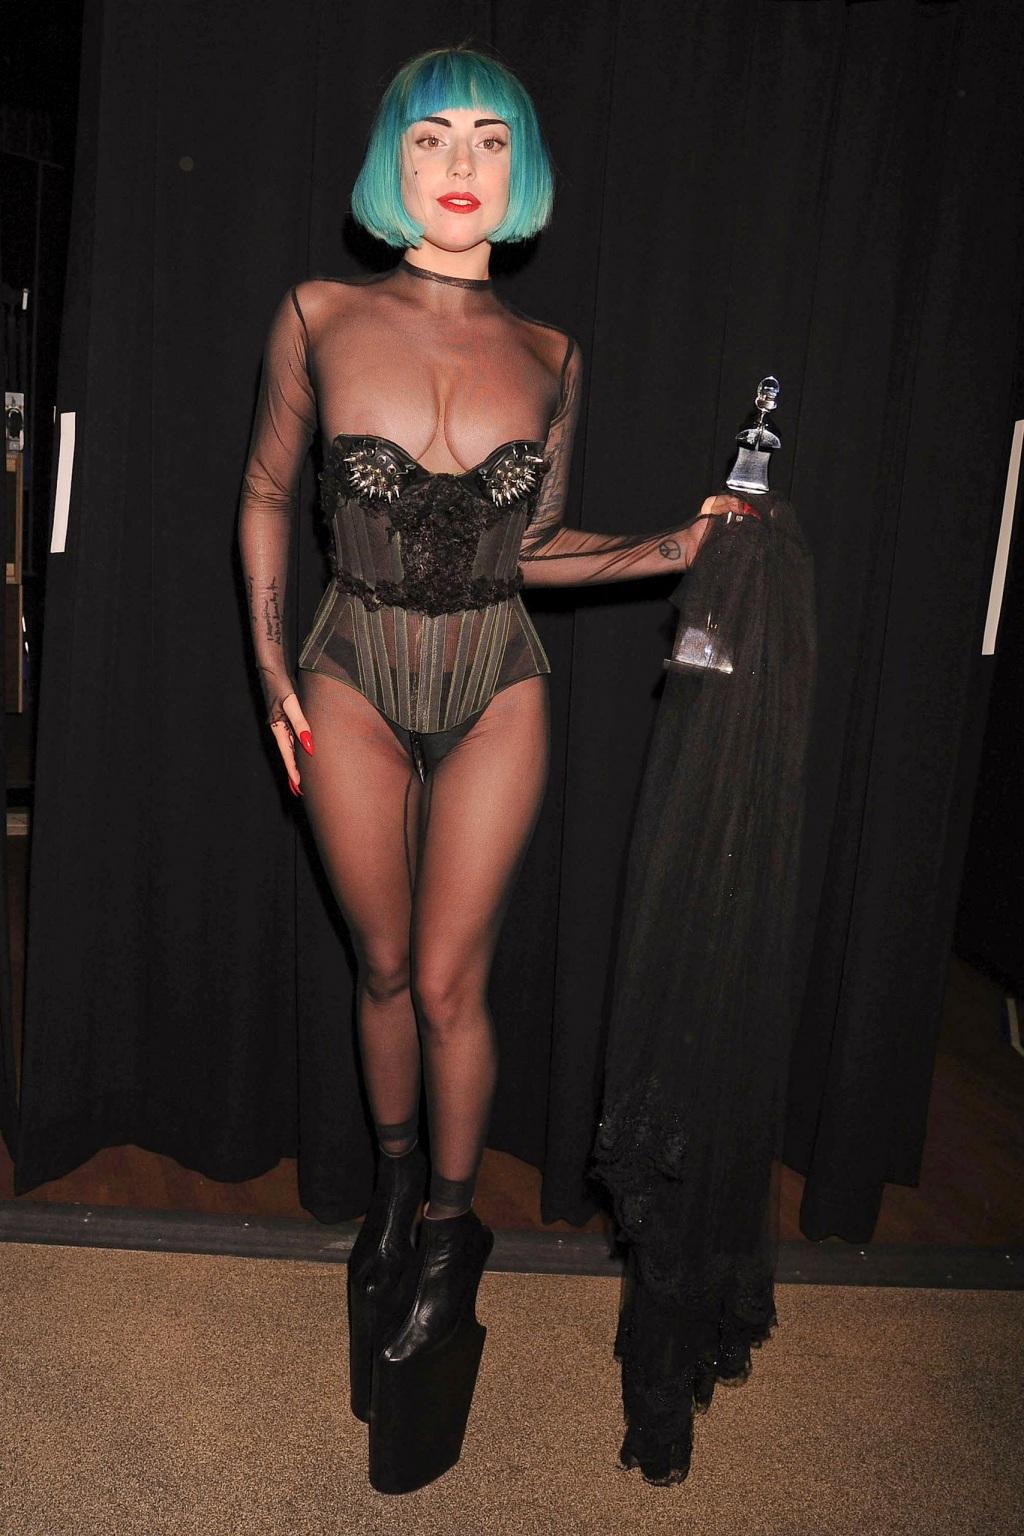 http://3.bp.blogspot.com/-oE5a8zLC8ag/UJeyhmrGxRI/AAAAAAAAGsw/J8O8FDC2zA8/s1600/1024_lady-gaga-at-cfda-fashion-awards-press-room-lady-gaga-awards-2065896185.jpg